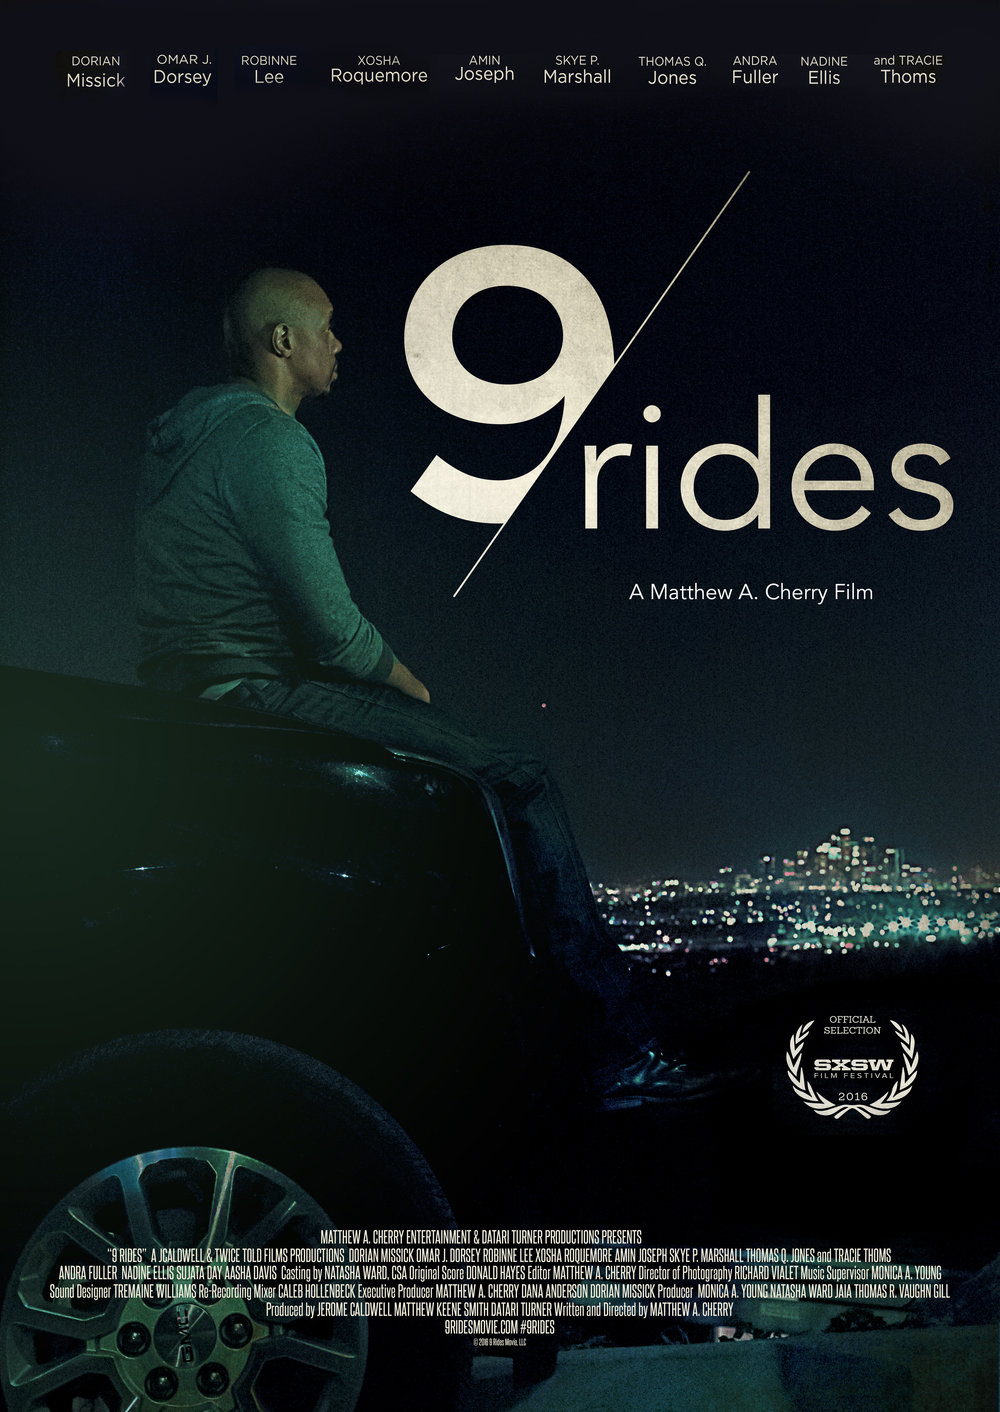 9 RIDES Poster.jpg